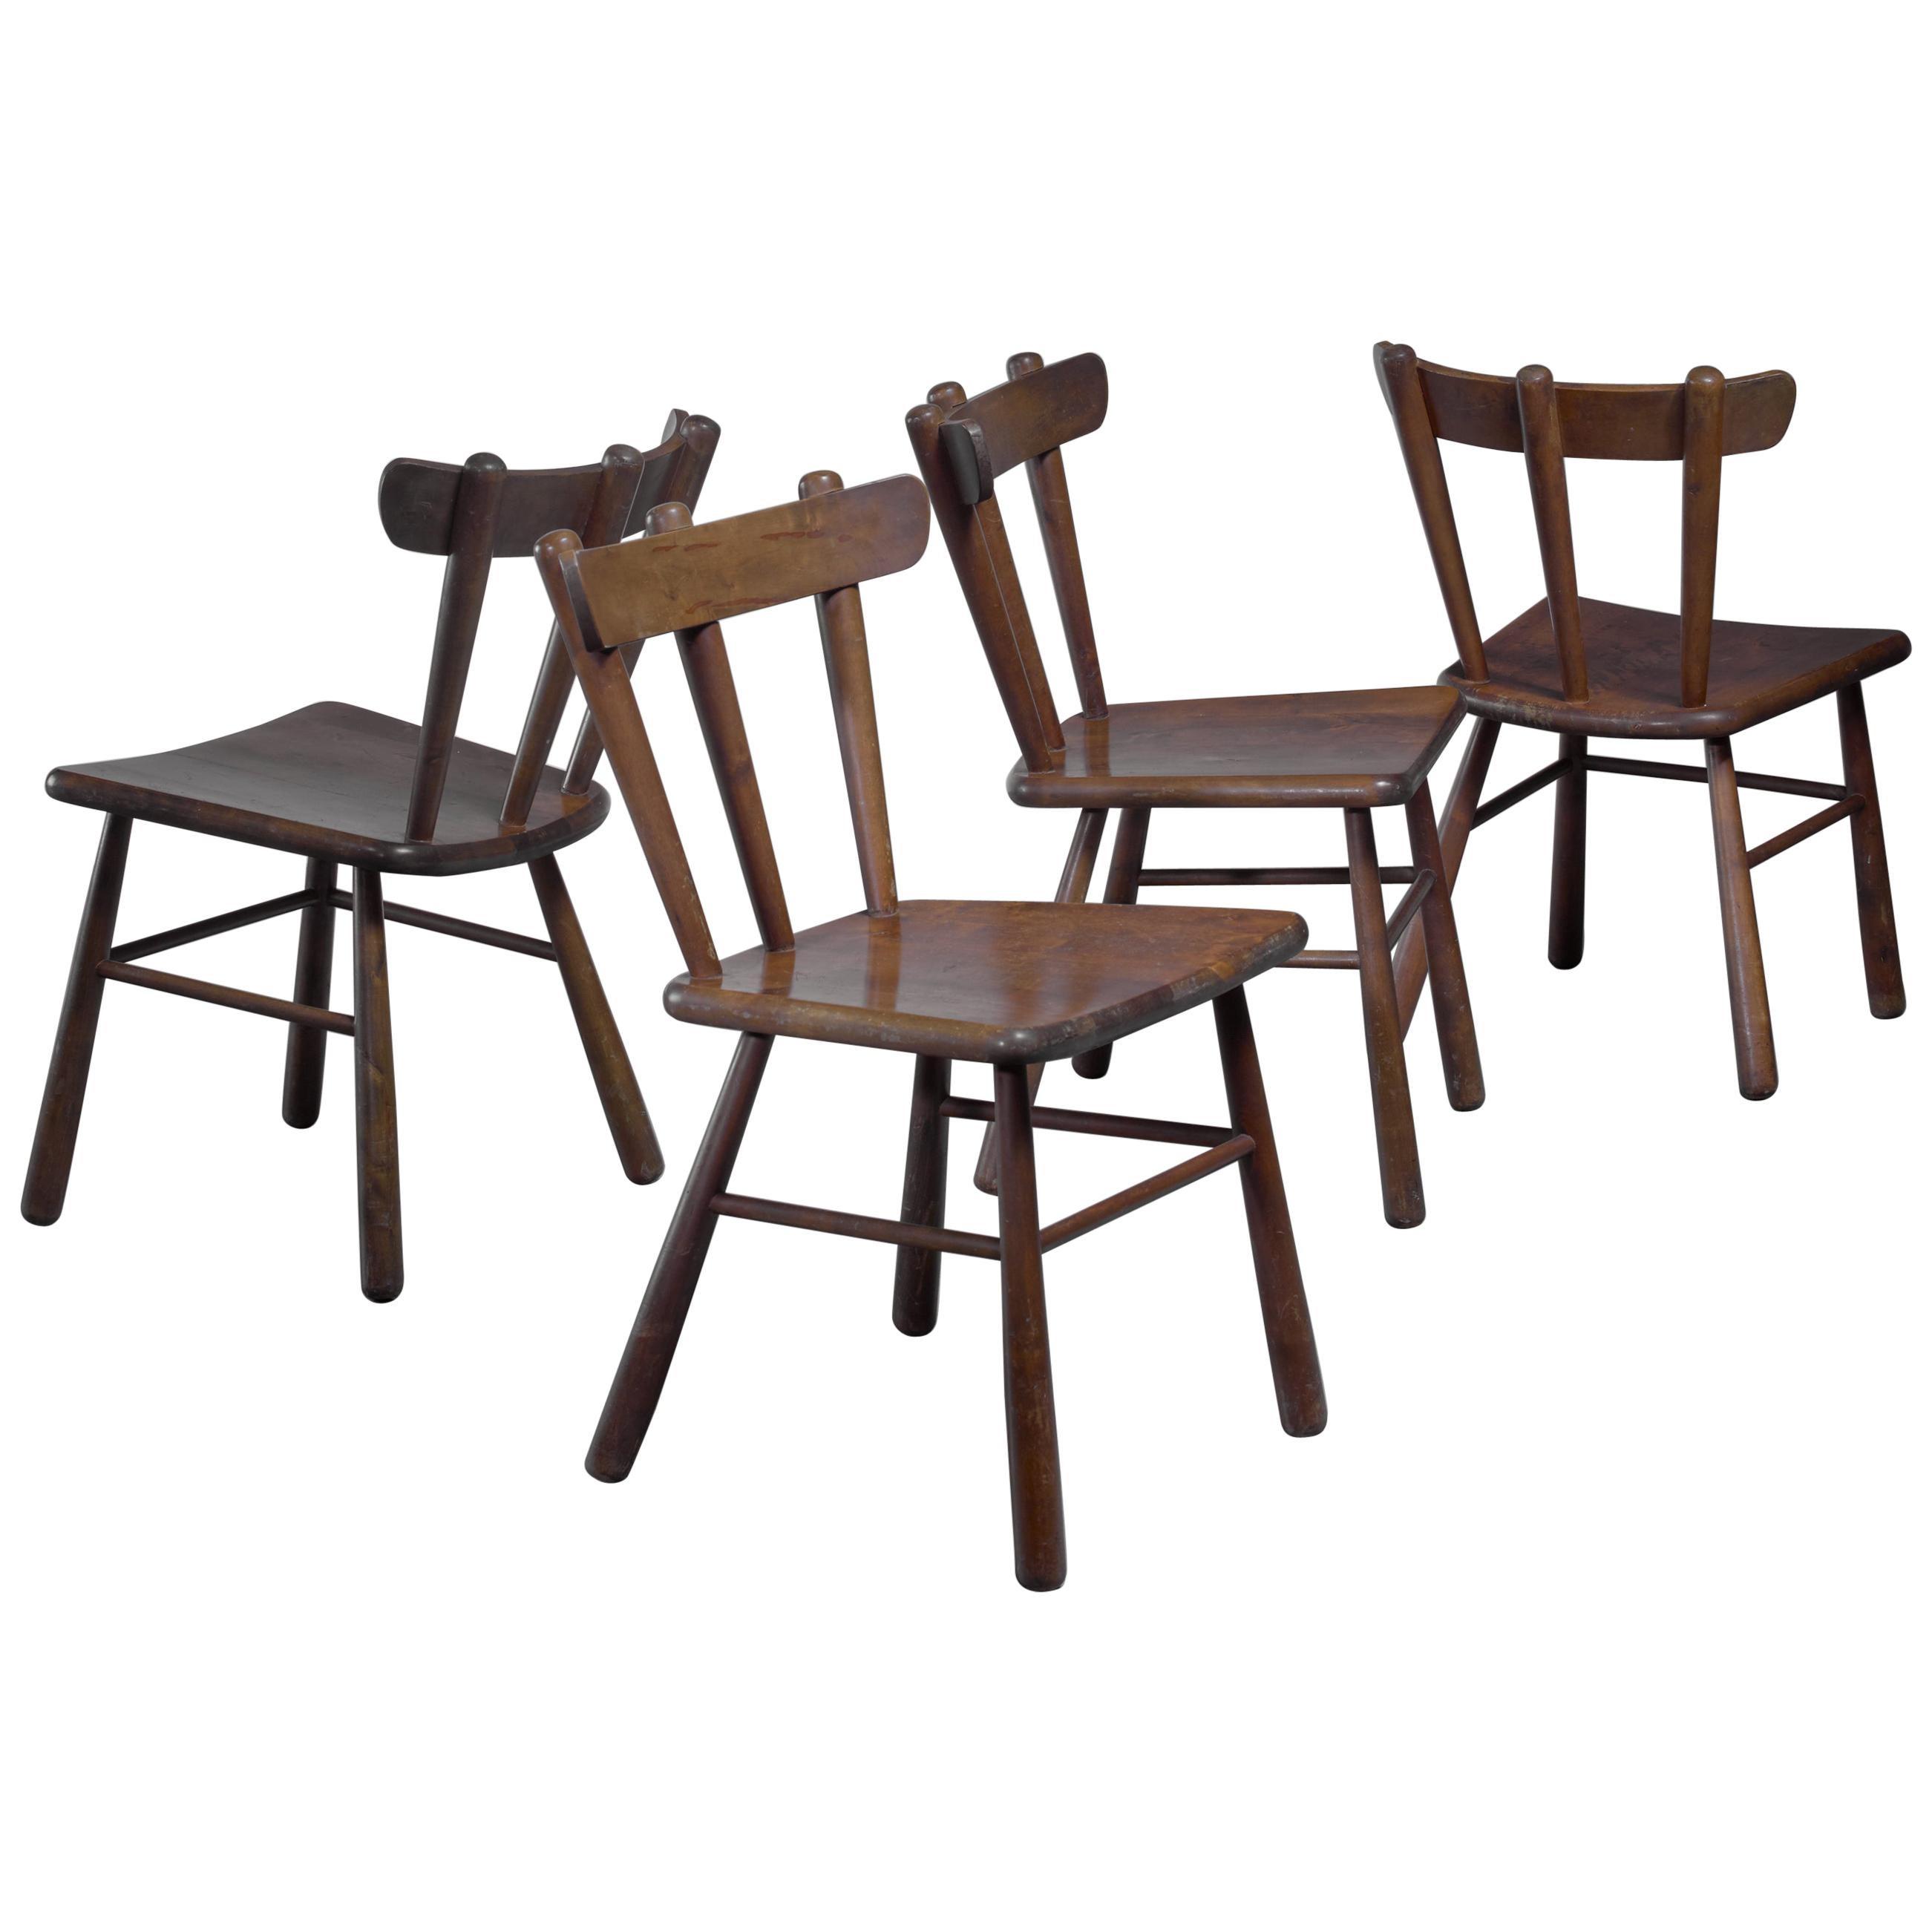 Set of Four Scandinavian Dining Chairs